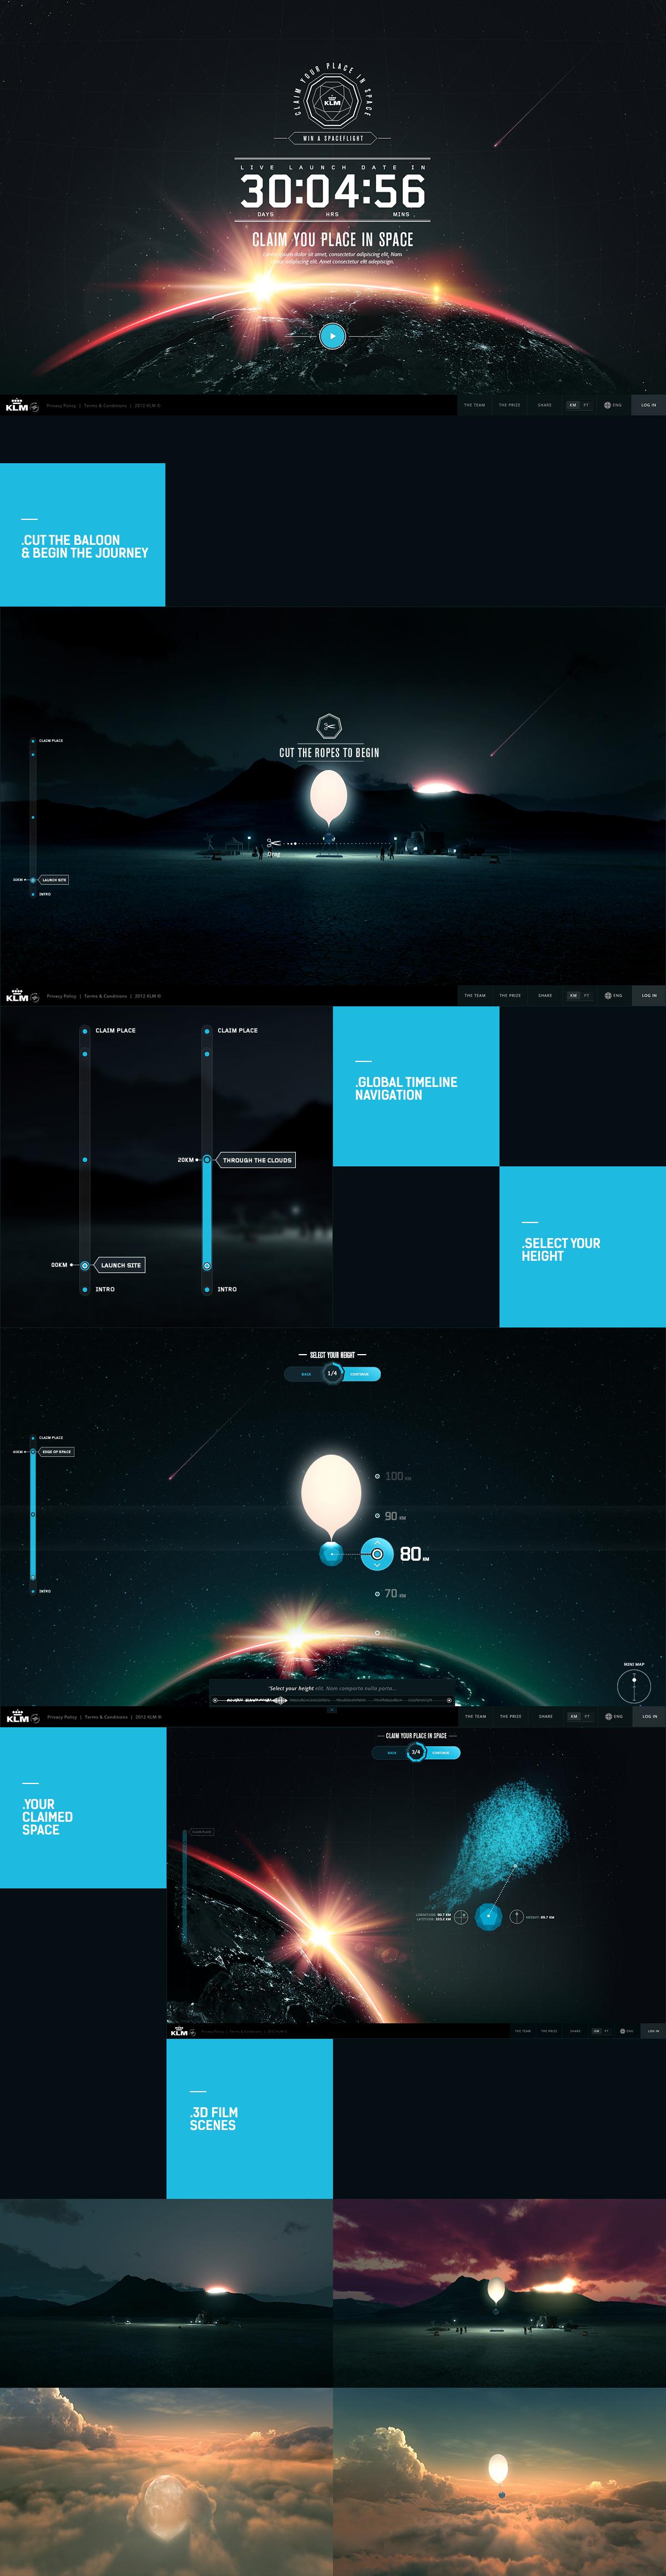 5 talentueux Webdesigners et Designers d'interface #5 Anthony goodman